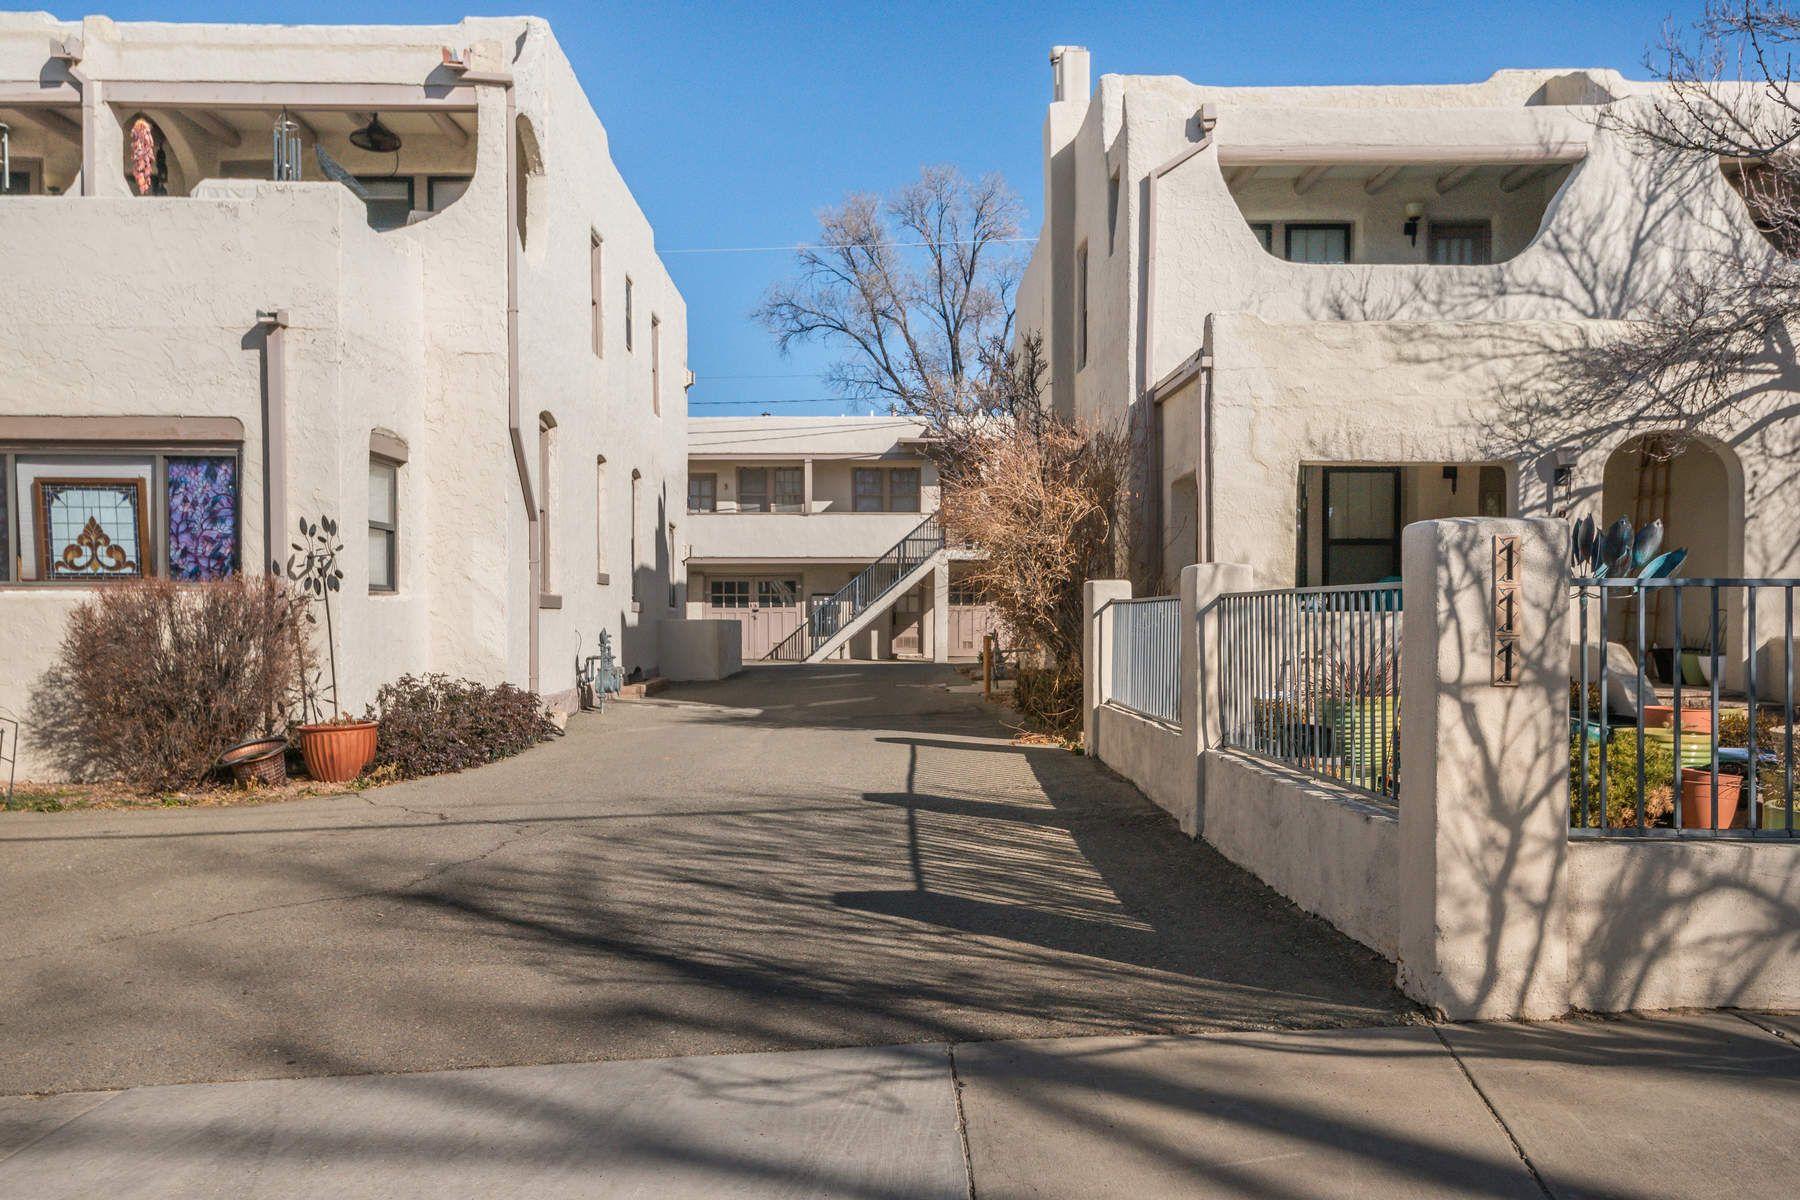 شقة بعمارة للـ Sale في 111 E Santa Fe Ave #2 Santa Fe City Southeast, Santa Fe, New Mexico, 87505 United States